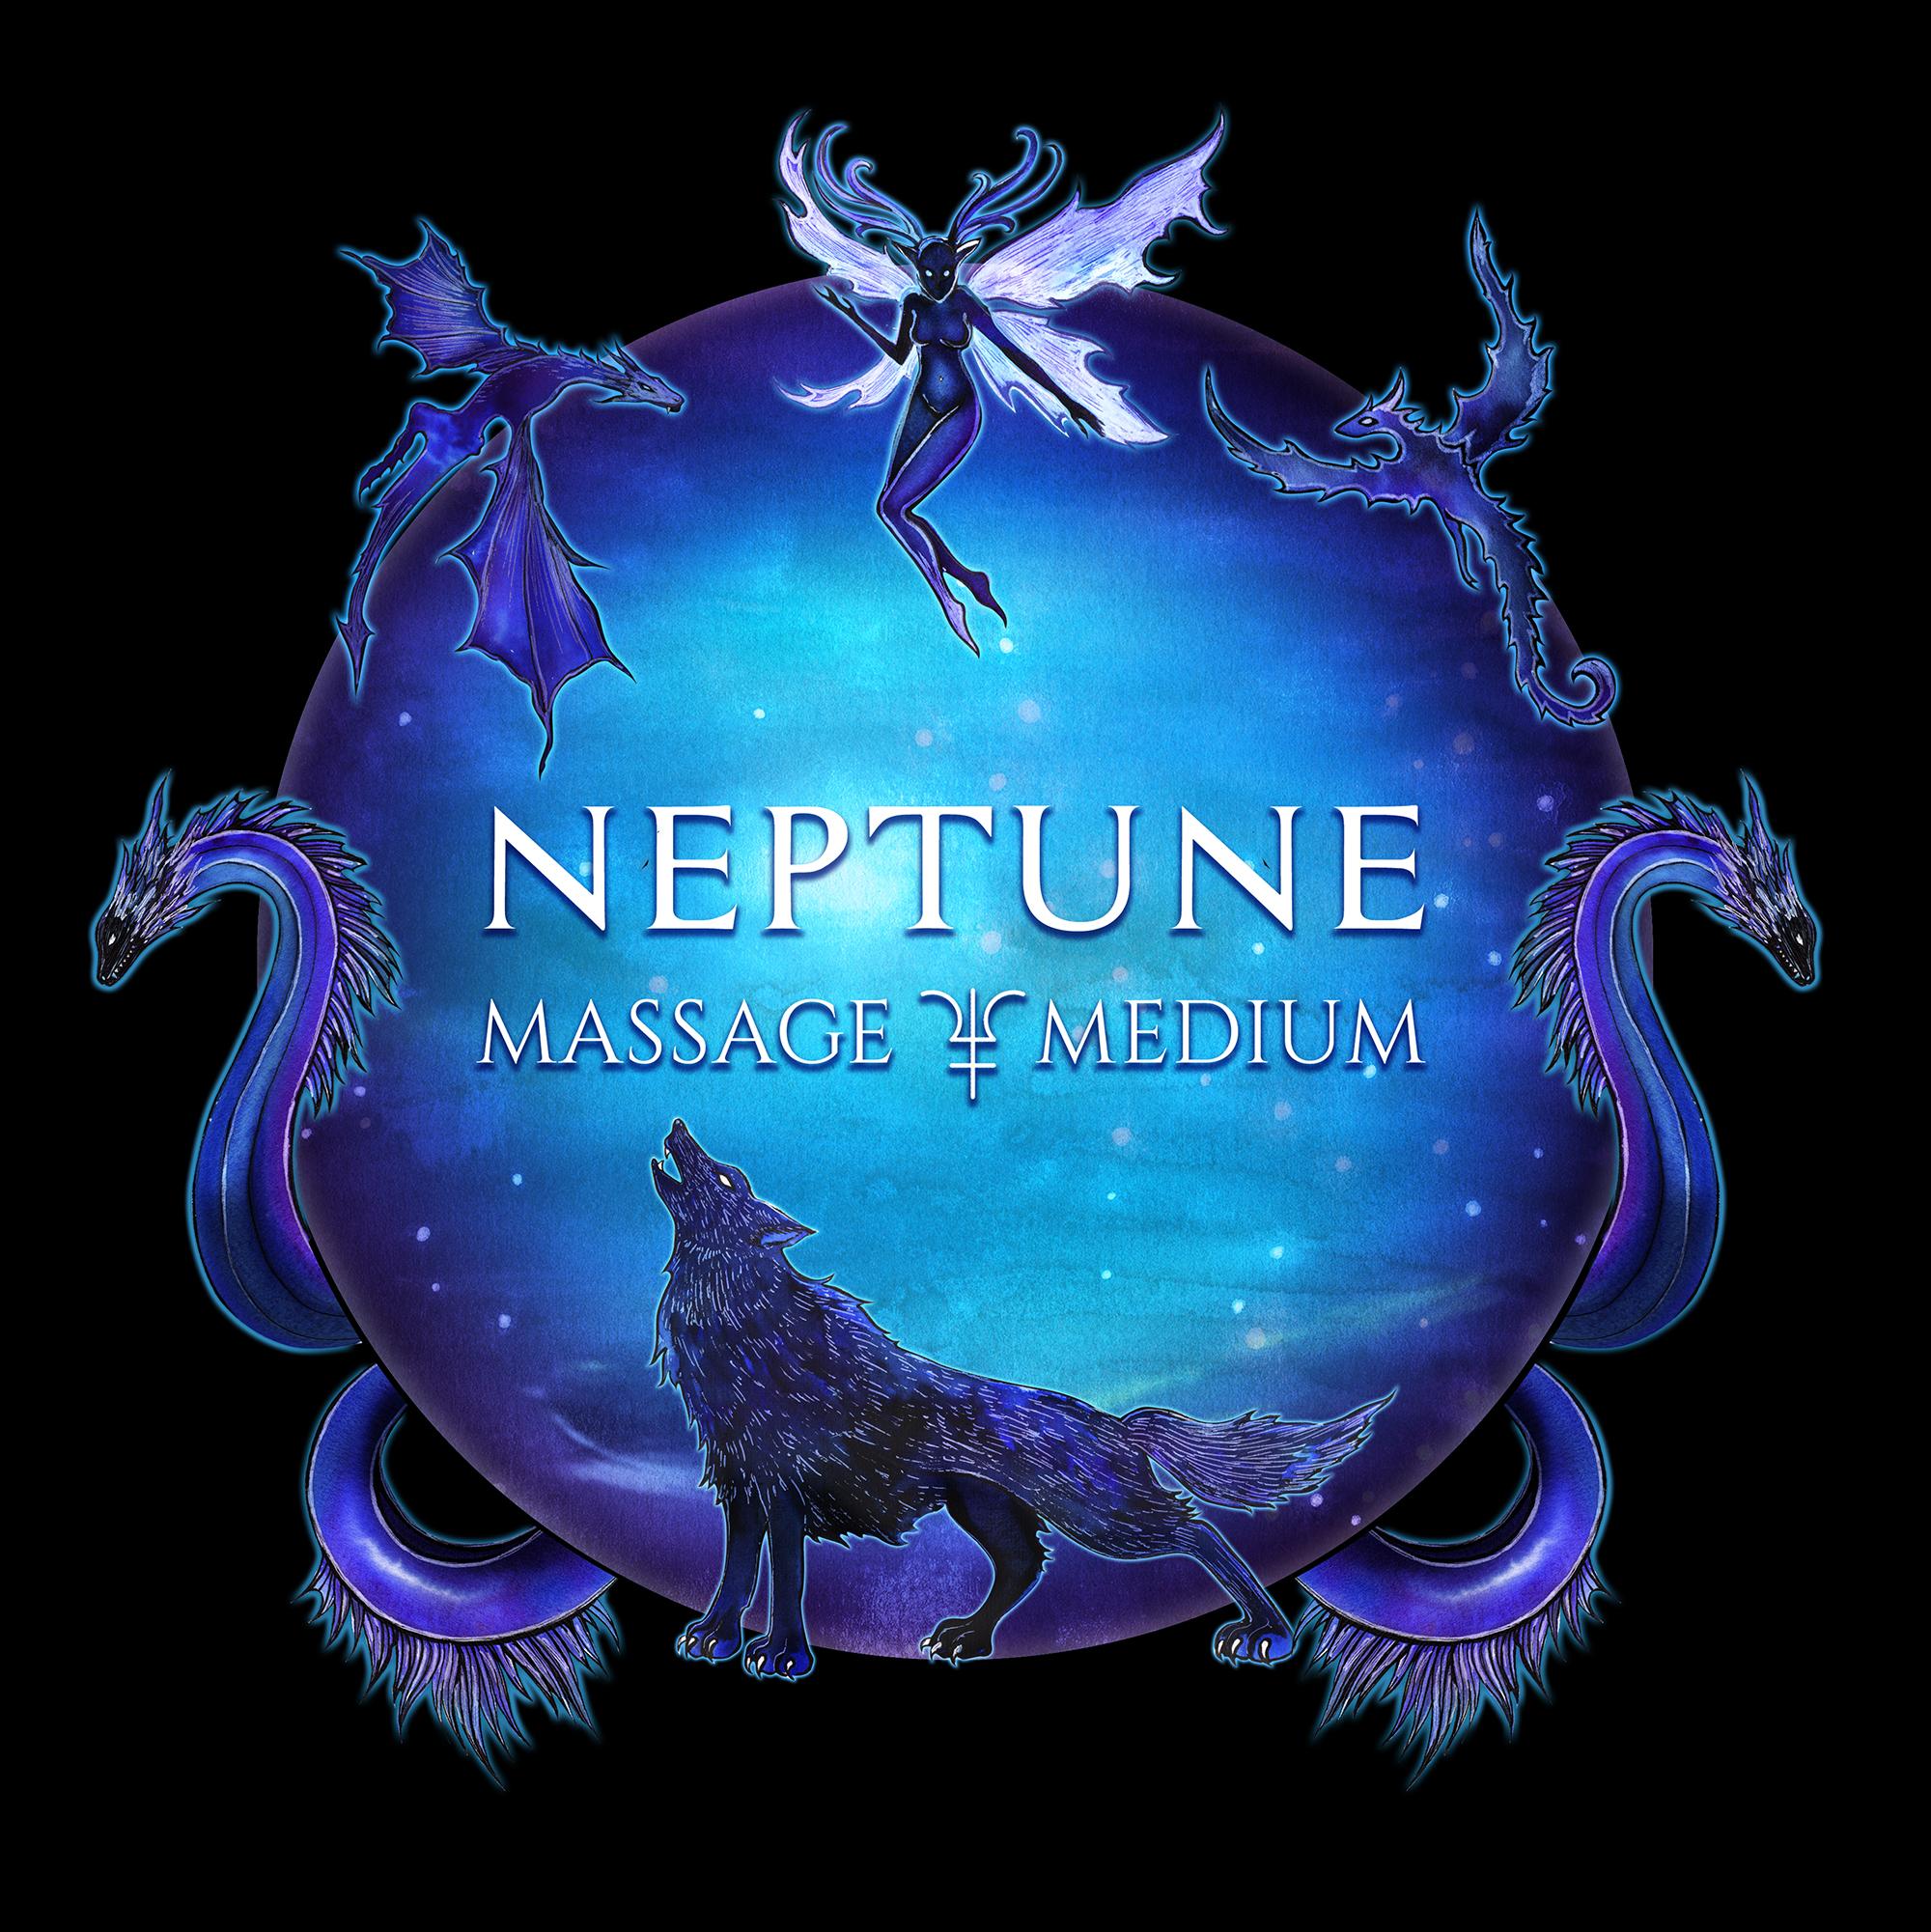 Neptune-Circle-design-web.jpg